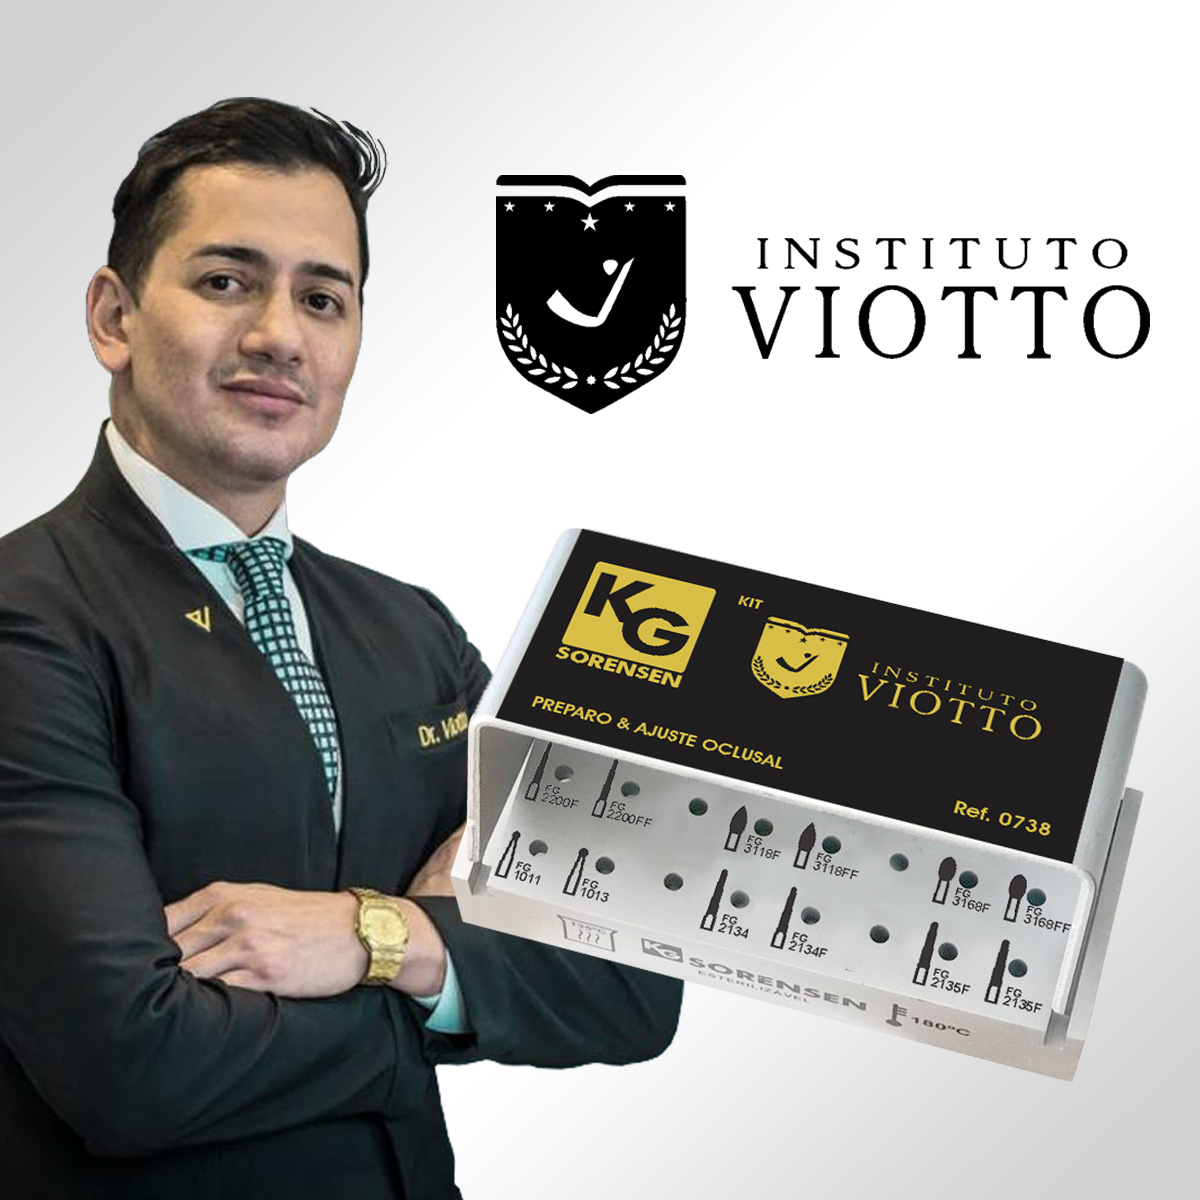 Kit Preparo & Ajuste Oclusal Instituto Viotto - Ref. 0738- KG SORENSEN